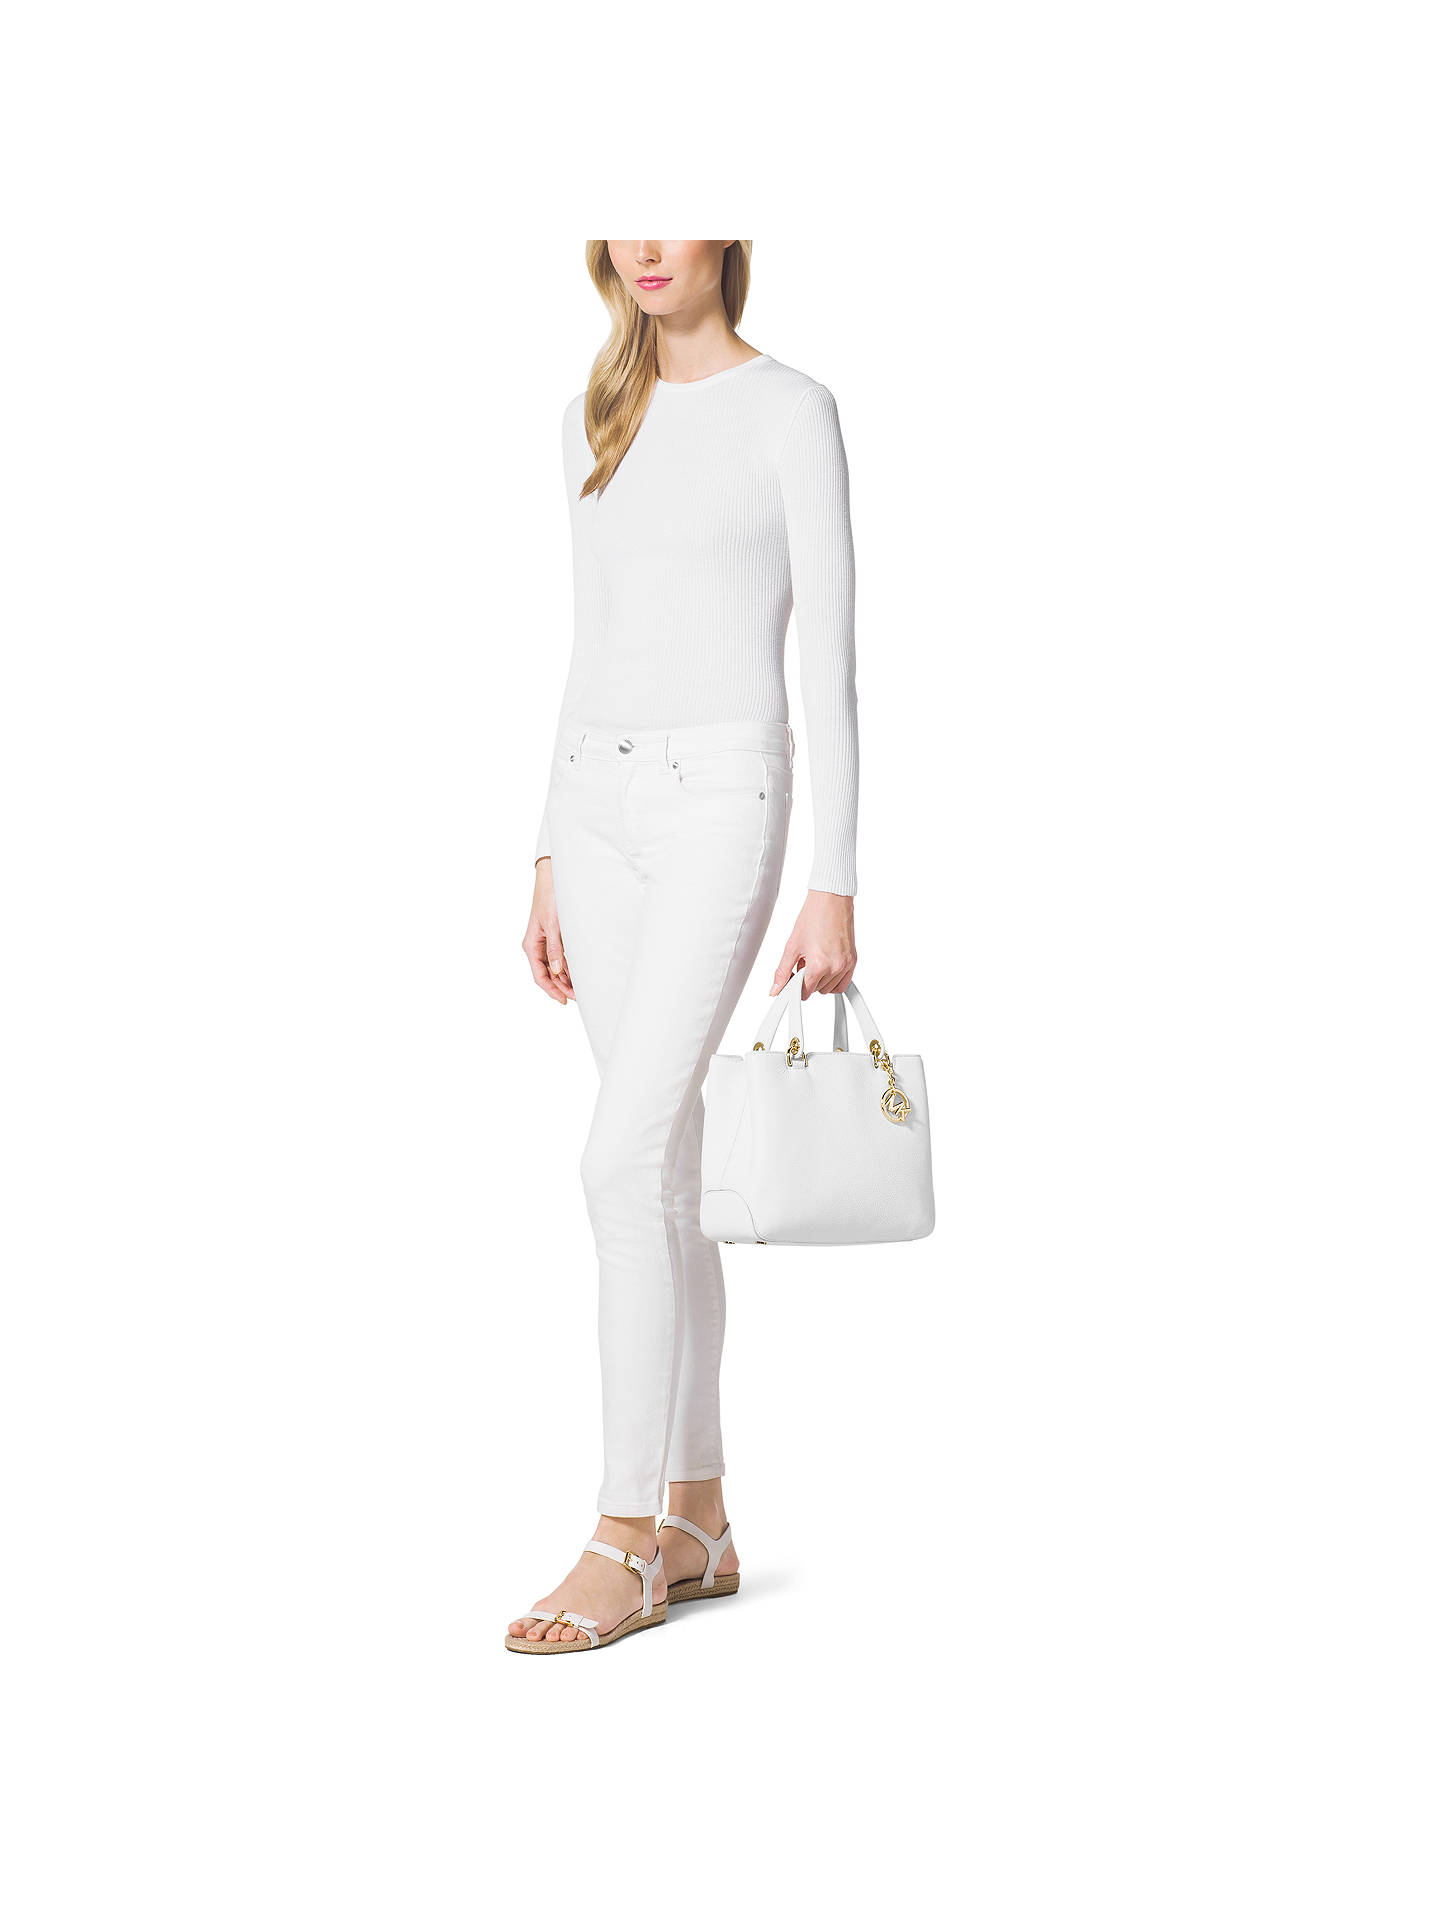 9d3cc0a12478 ... Buy MICHAEL Michael Kors Anabelle Medium Top Zip Leather Tote Bag